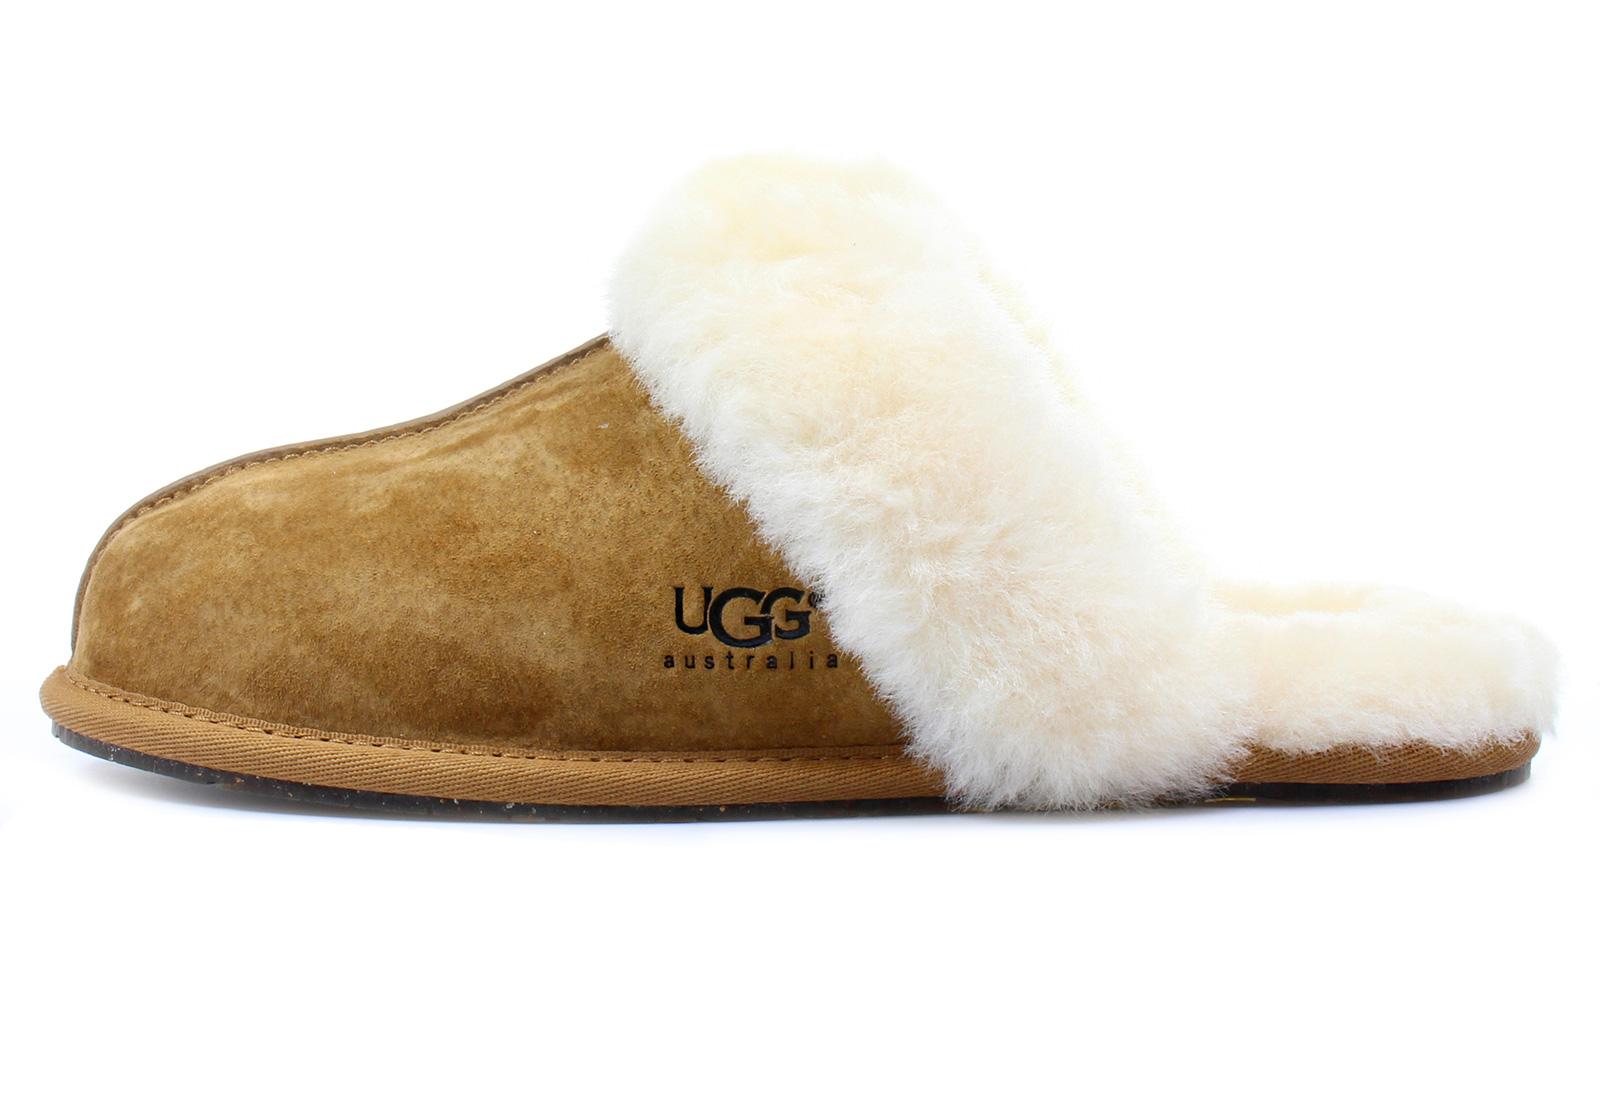 fa6be73e3b5 Women's Scuffette Ii Ugg Slippers Size 9 Color Sand | www.nanomat ...